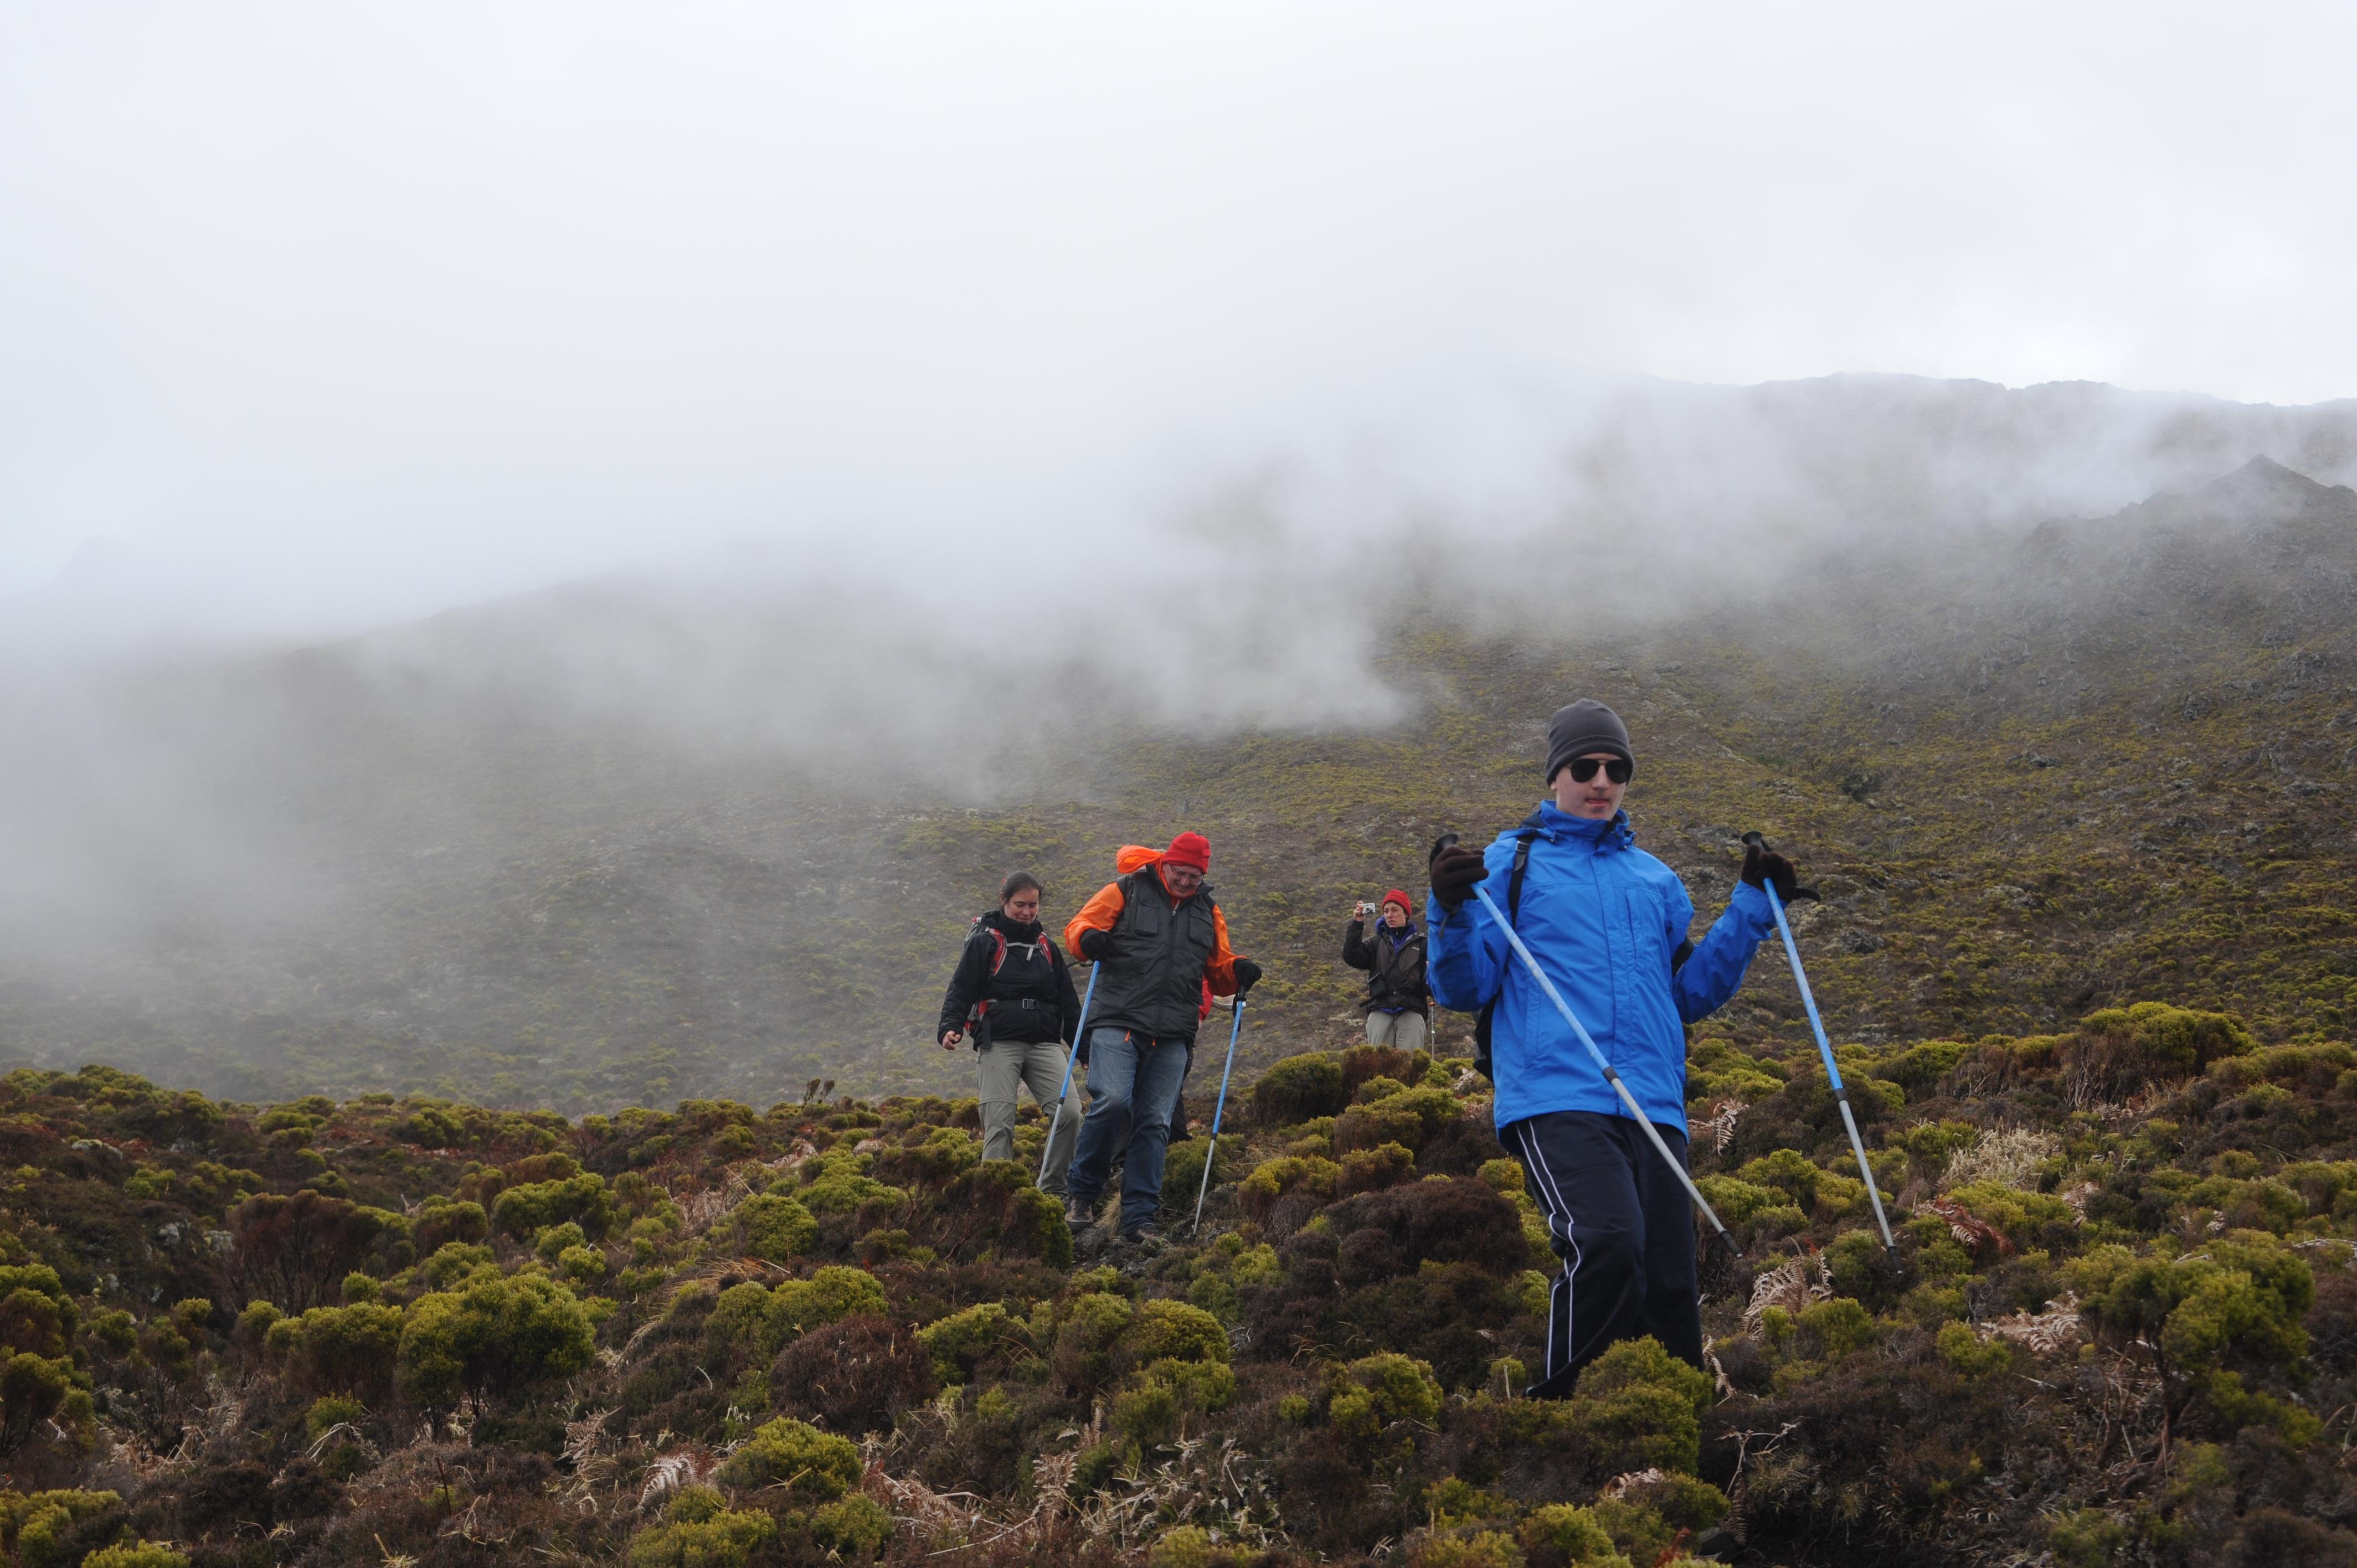 Climbing Pico moutain